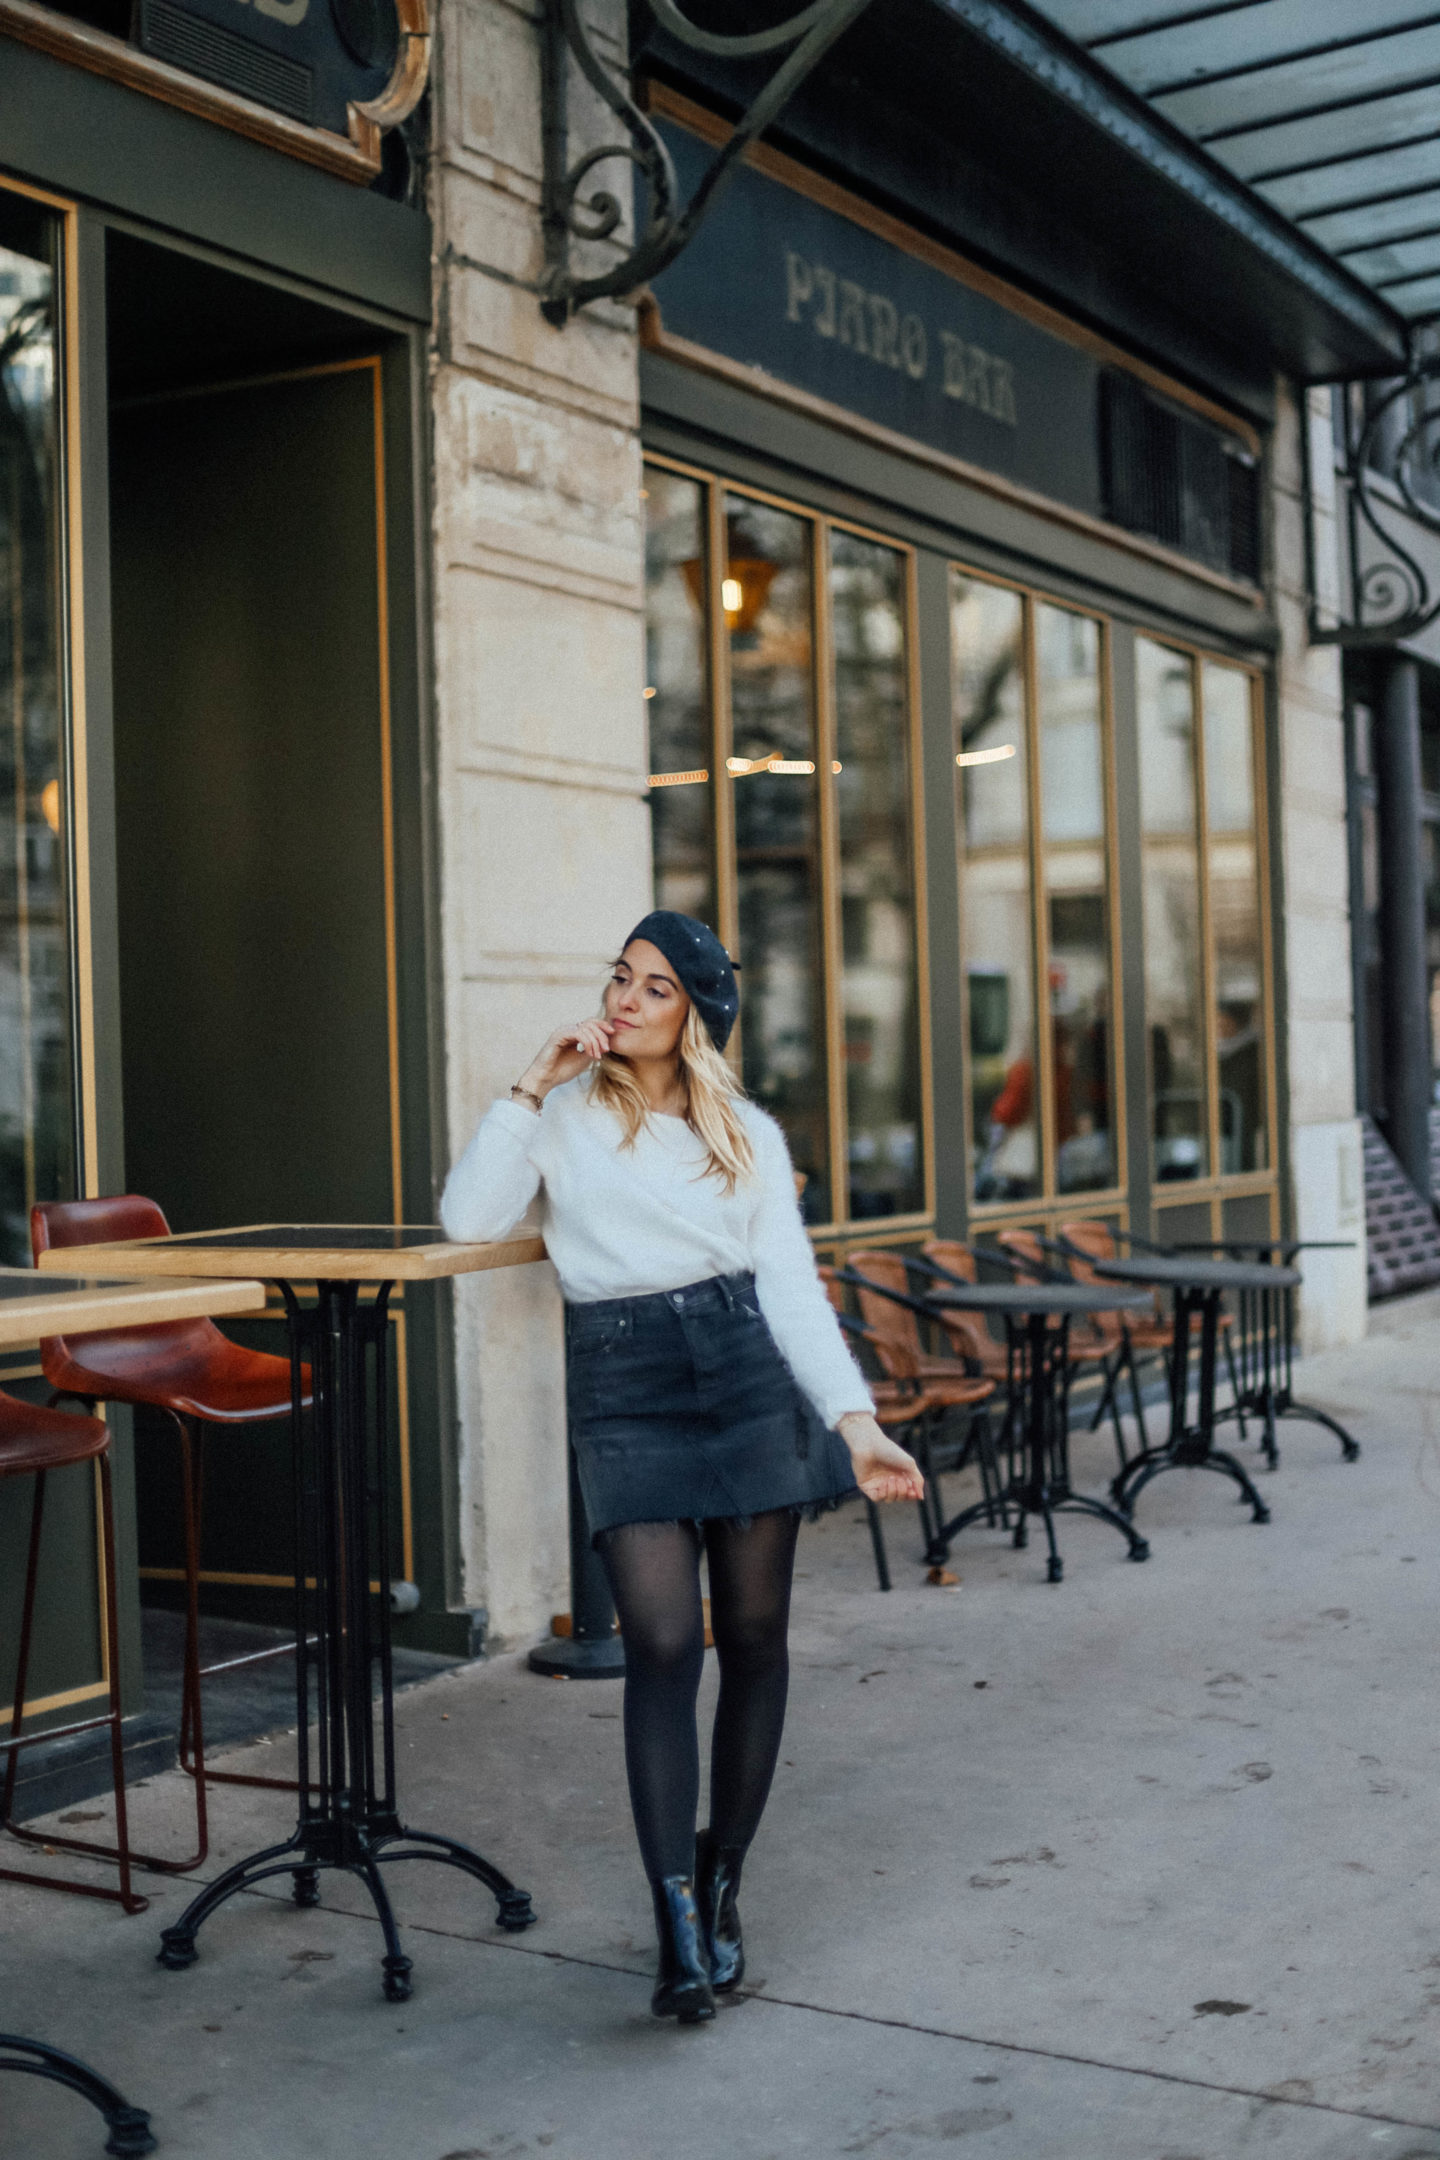 Béret gris perles Primark - Blondie Baby blog mode et voyages